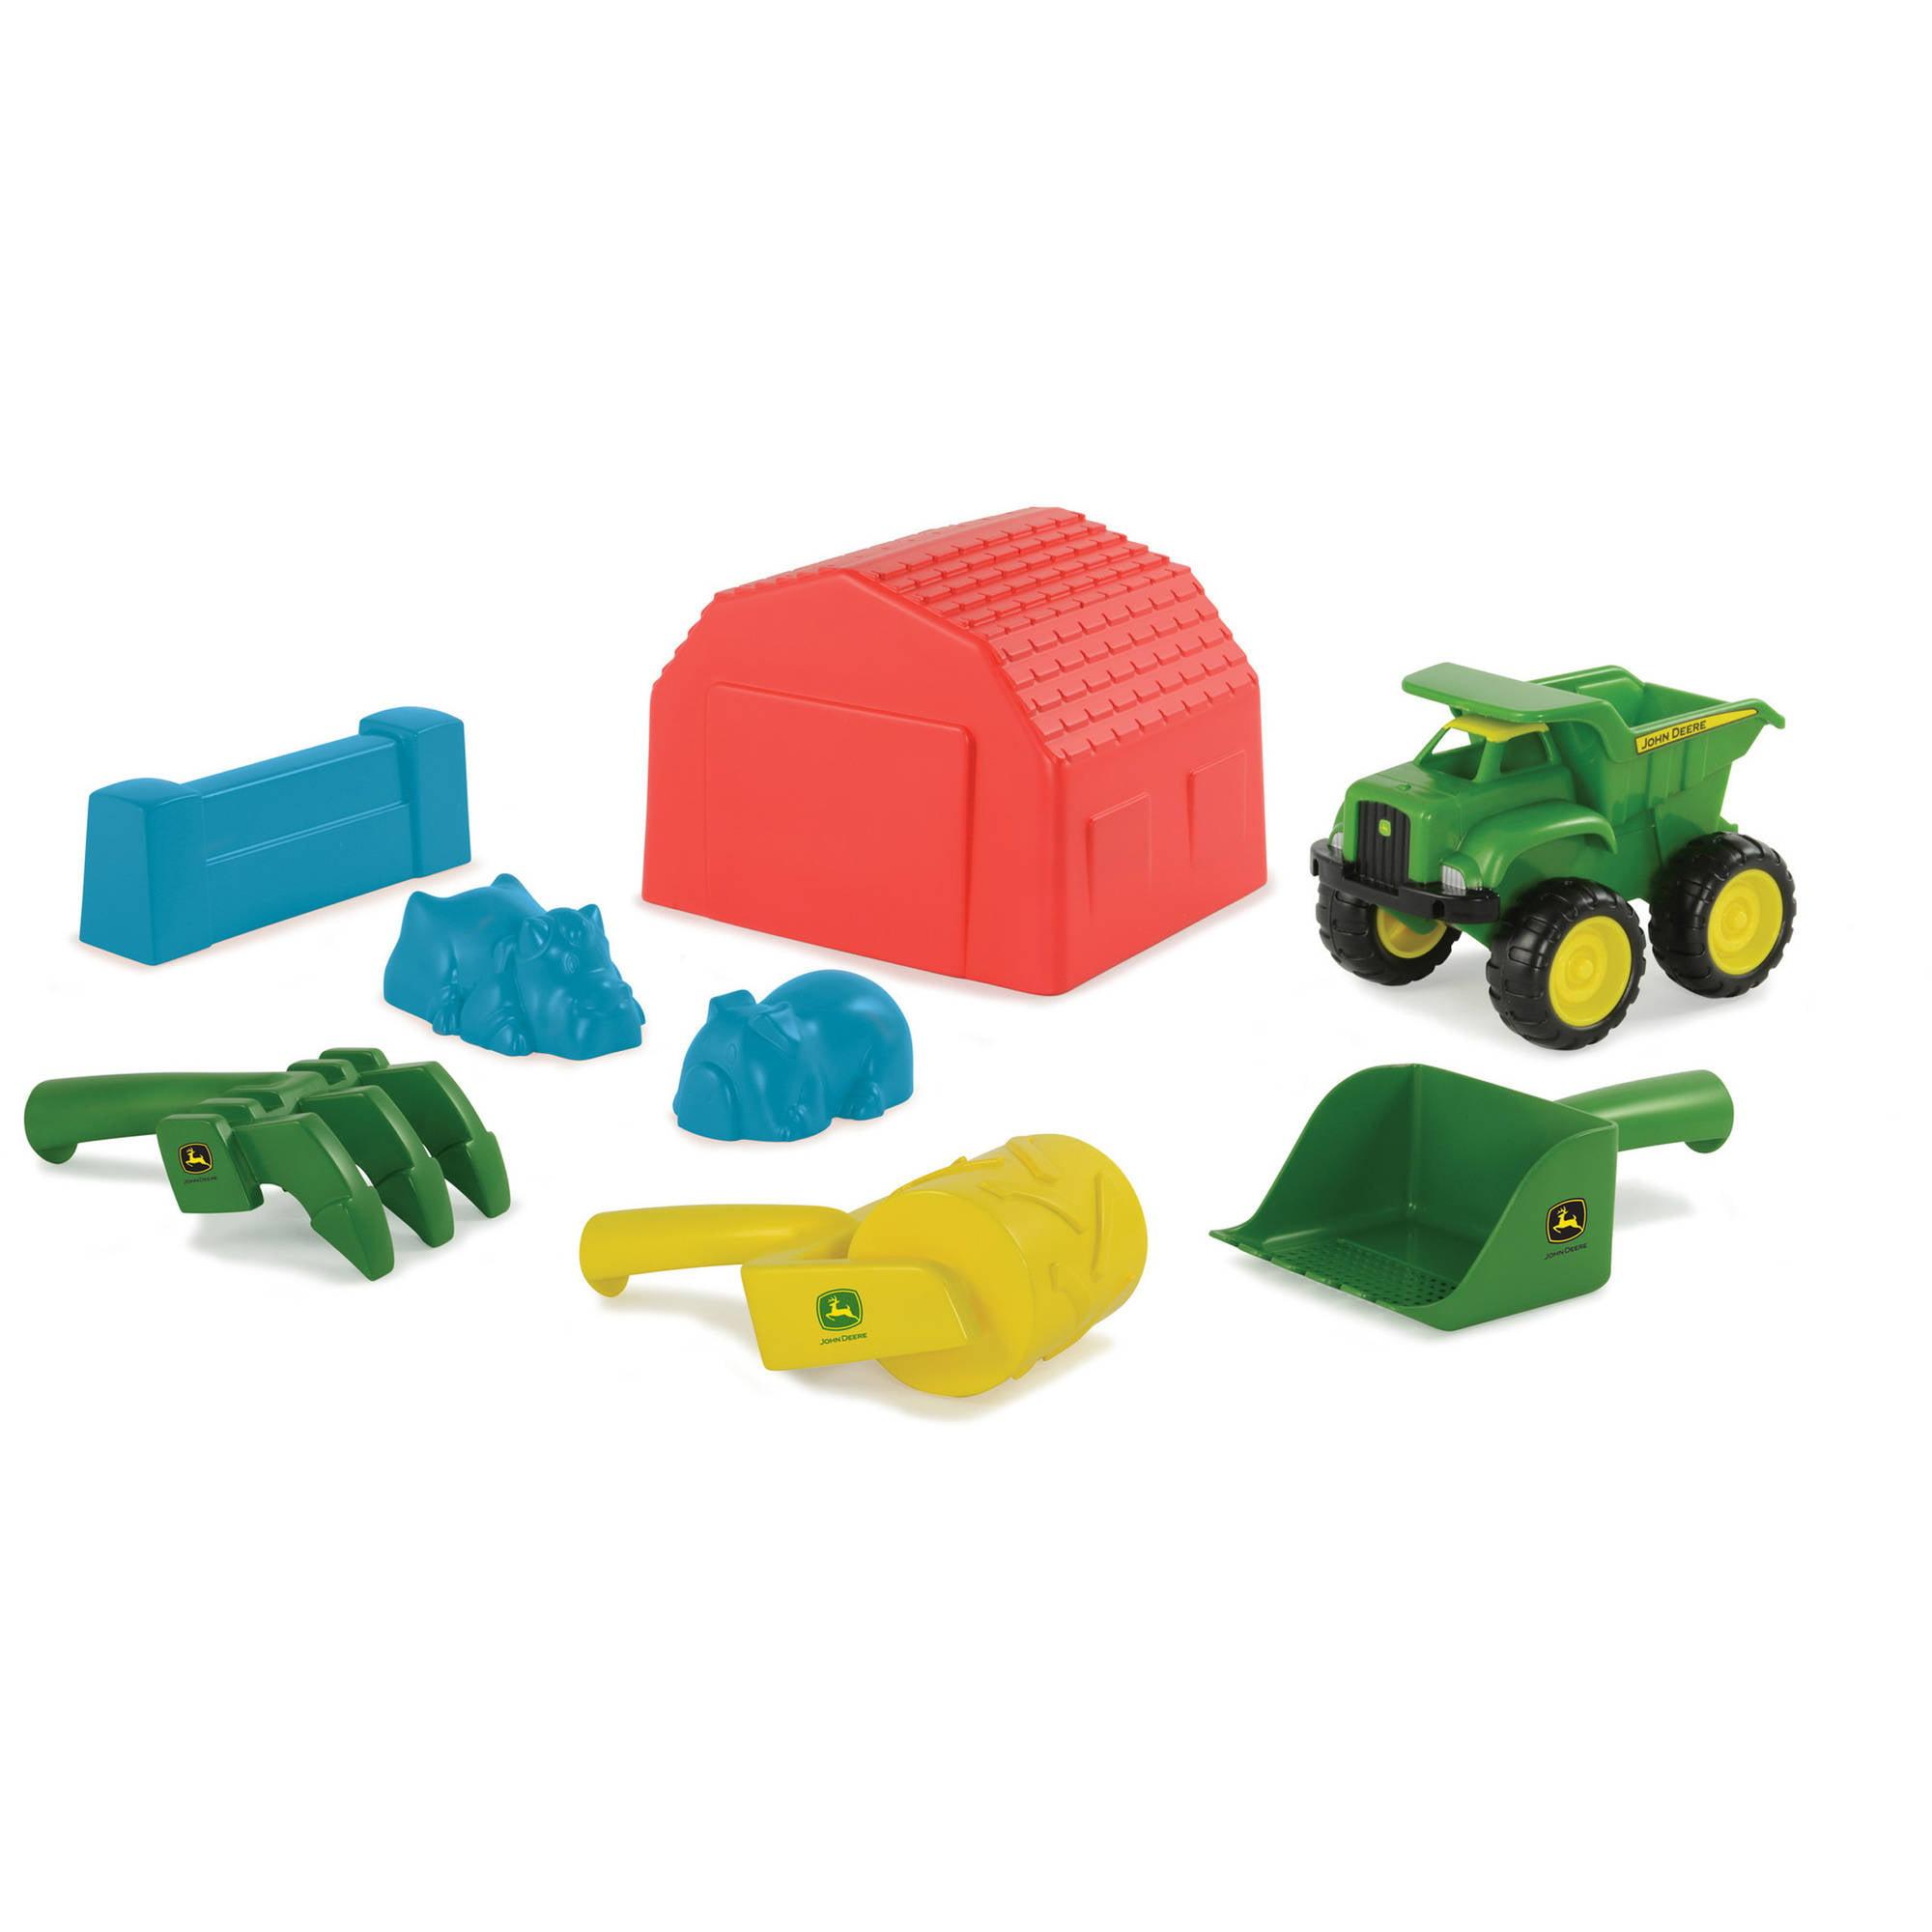 TOMY John Deere Sand Toy Set Walmart